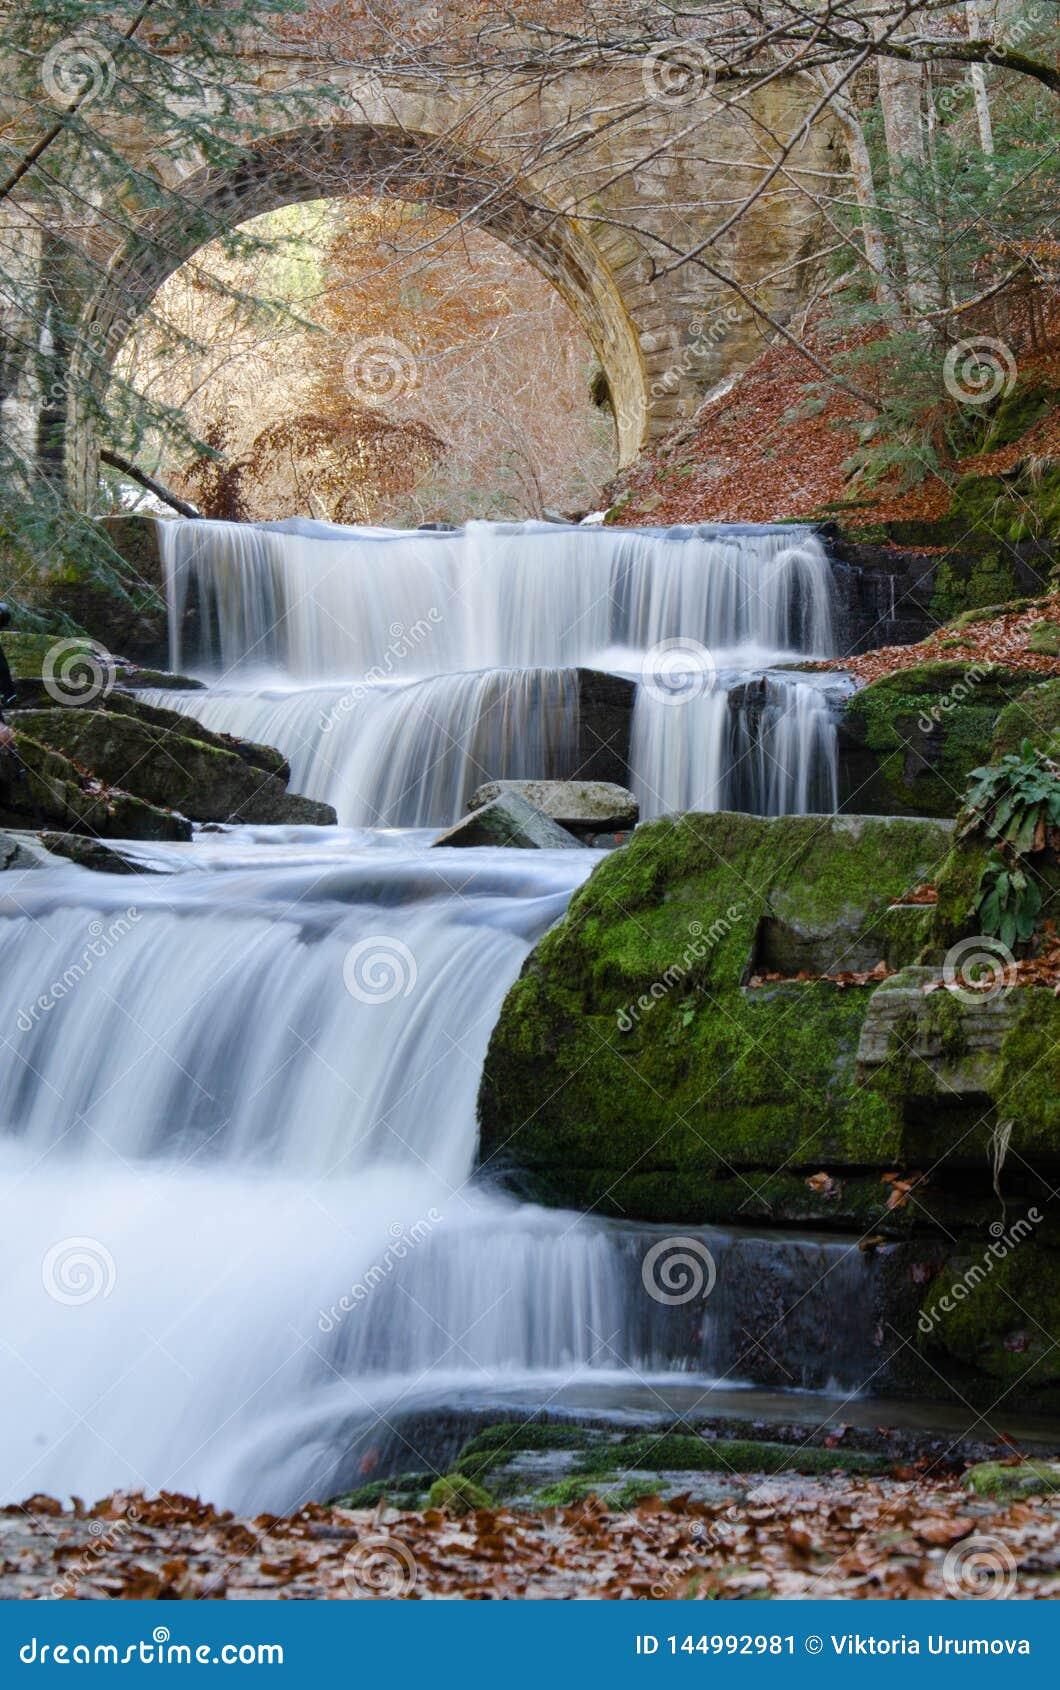 Красивый водопад около деревни Sitovo, Пловдива, Болгарии